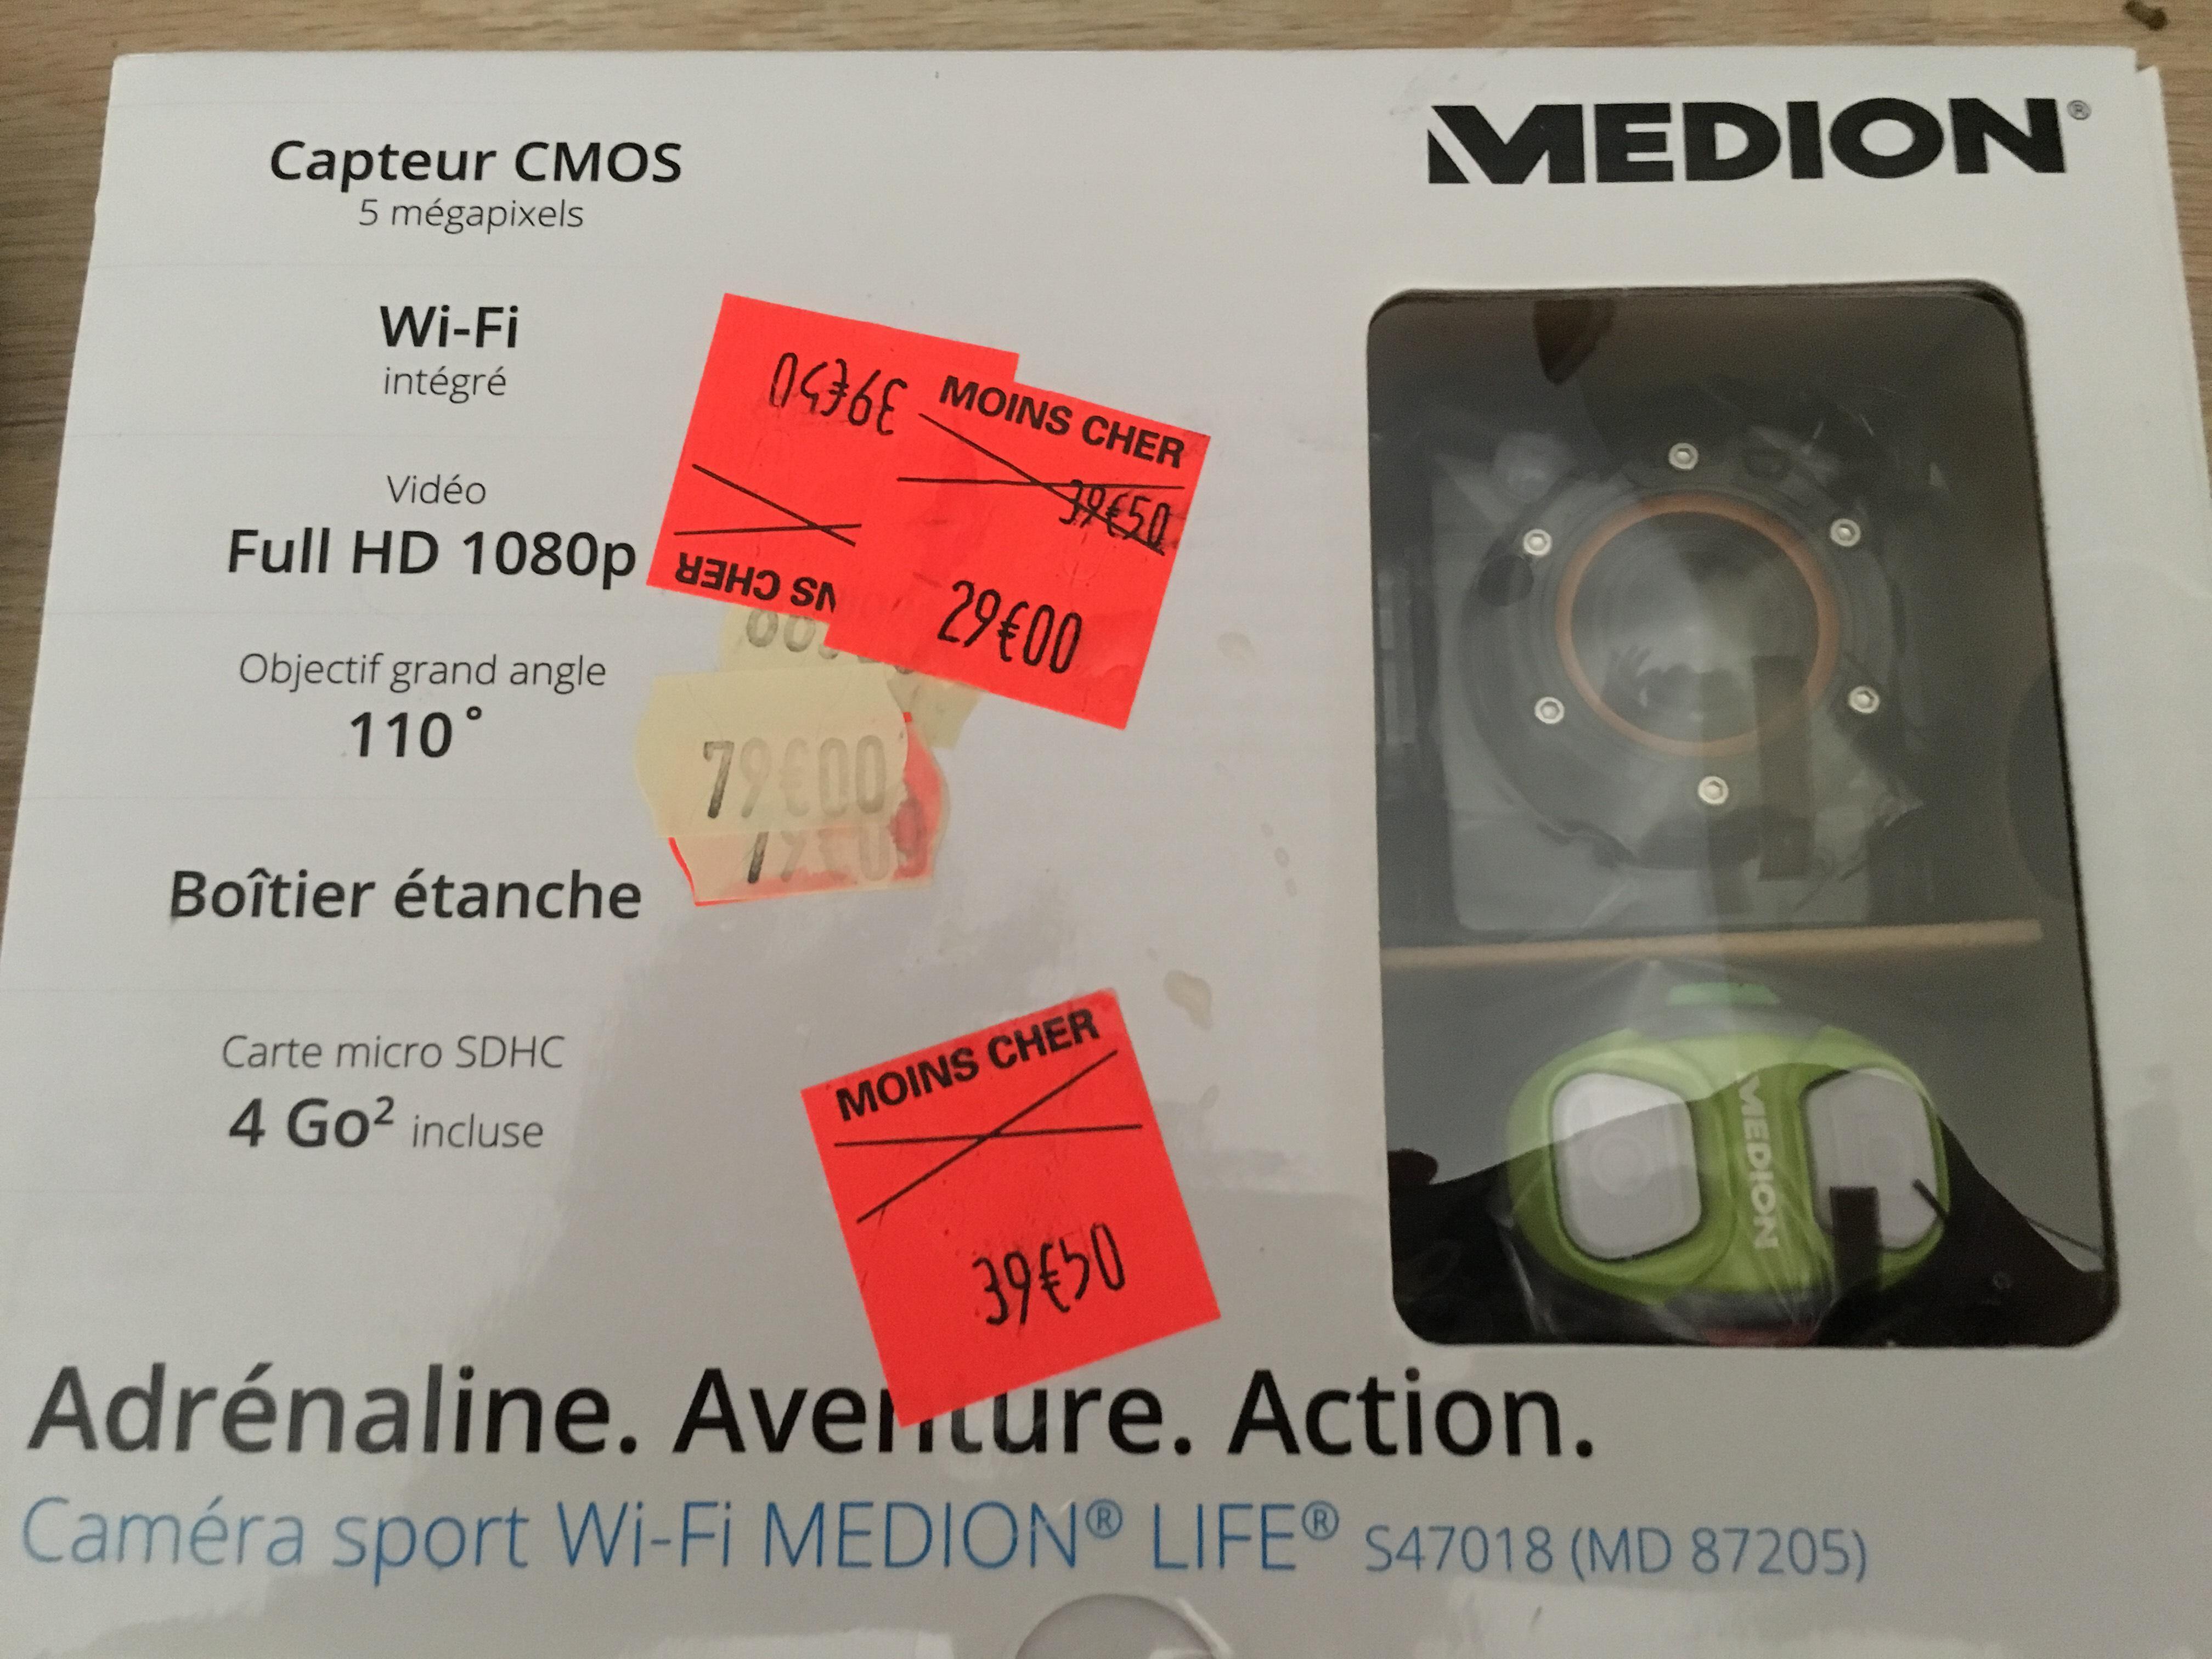 camera sport Medion Life S47018 avec boitier étanche et carte SD 4 Go